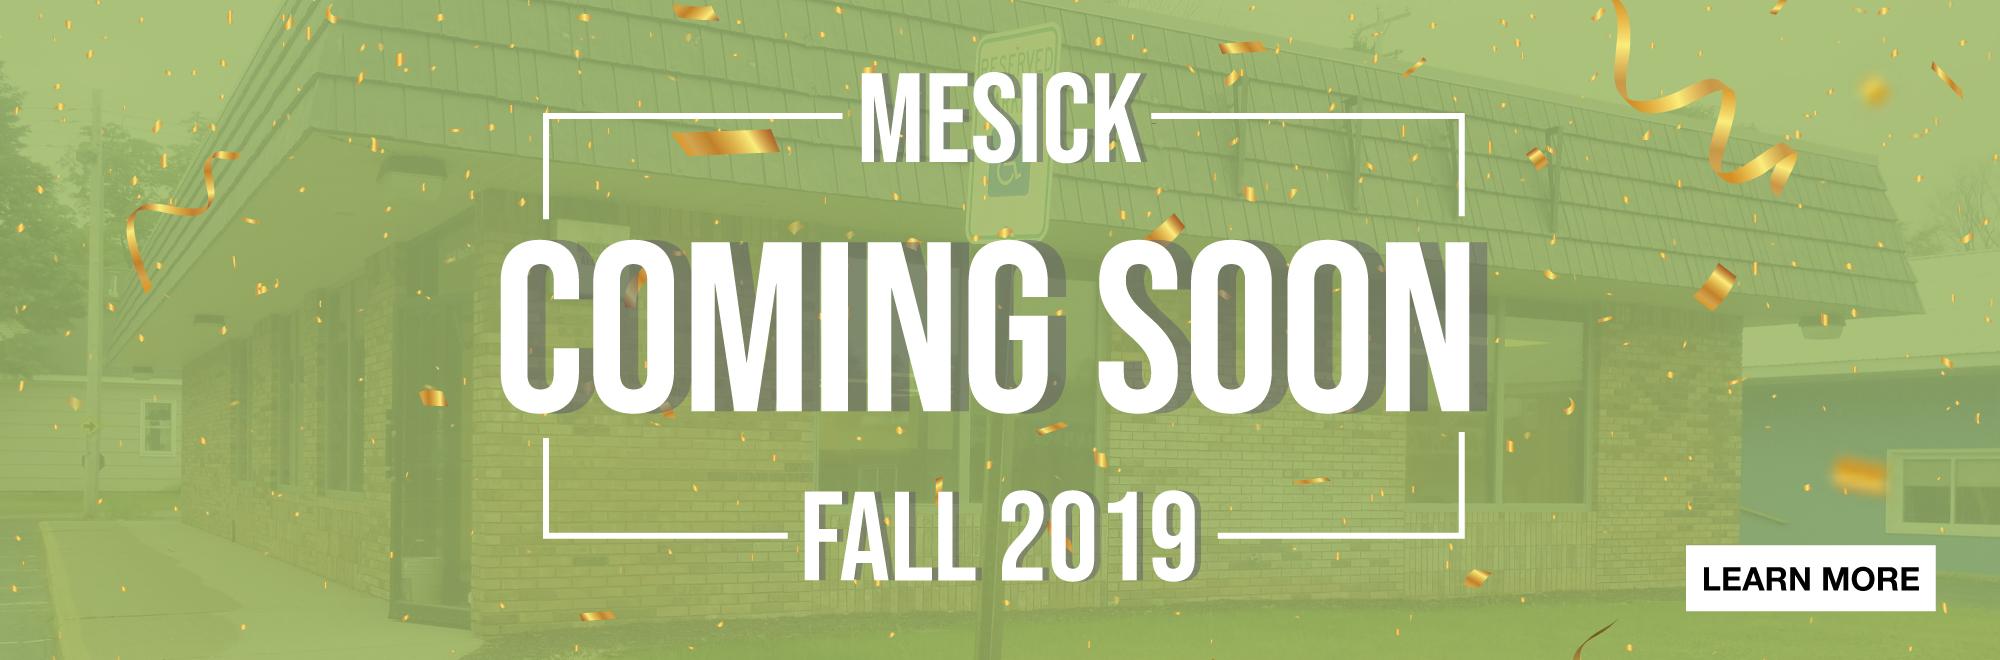 Mesick Branch Coming Fall 2019